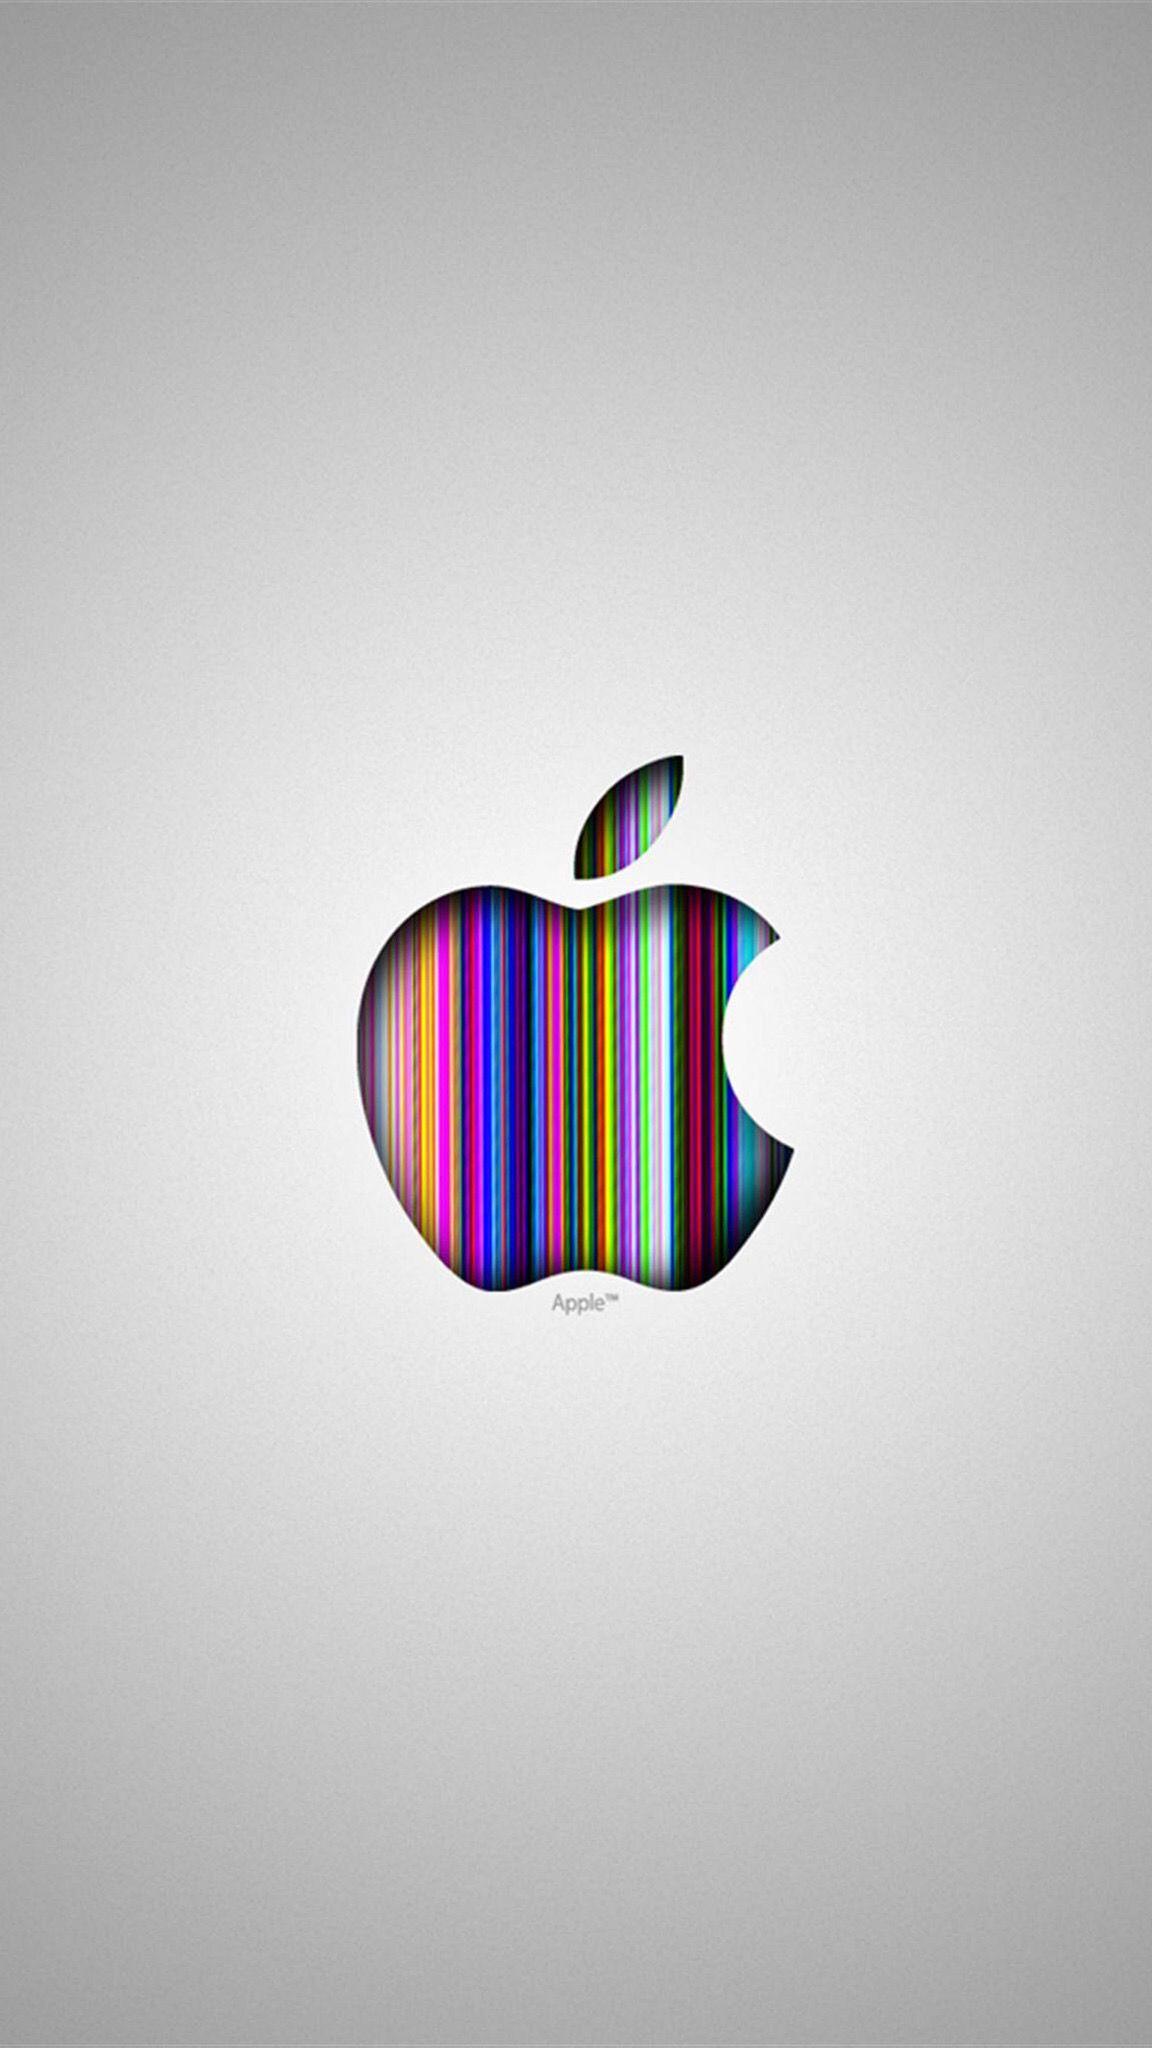 Pin by Keith Savage on Logos Apple wallpaper, Apple logo